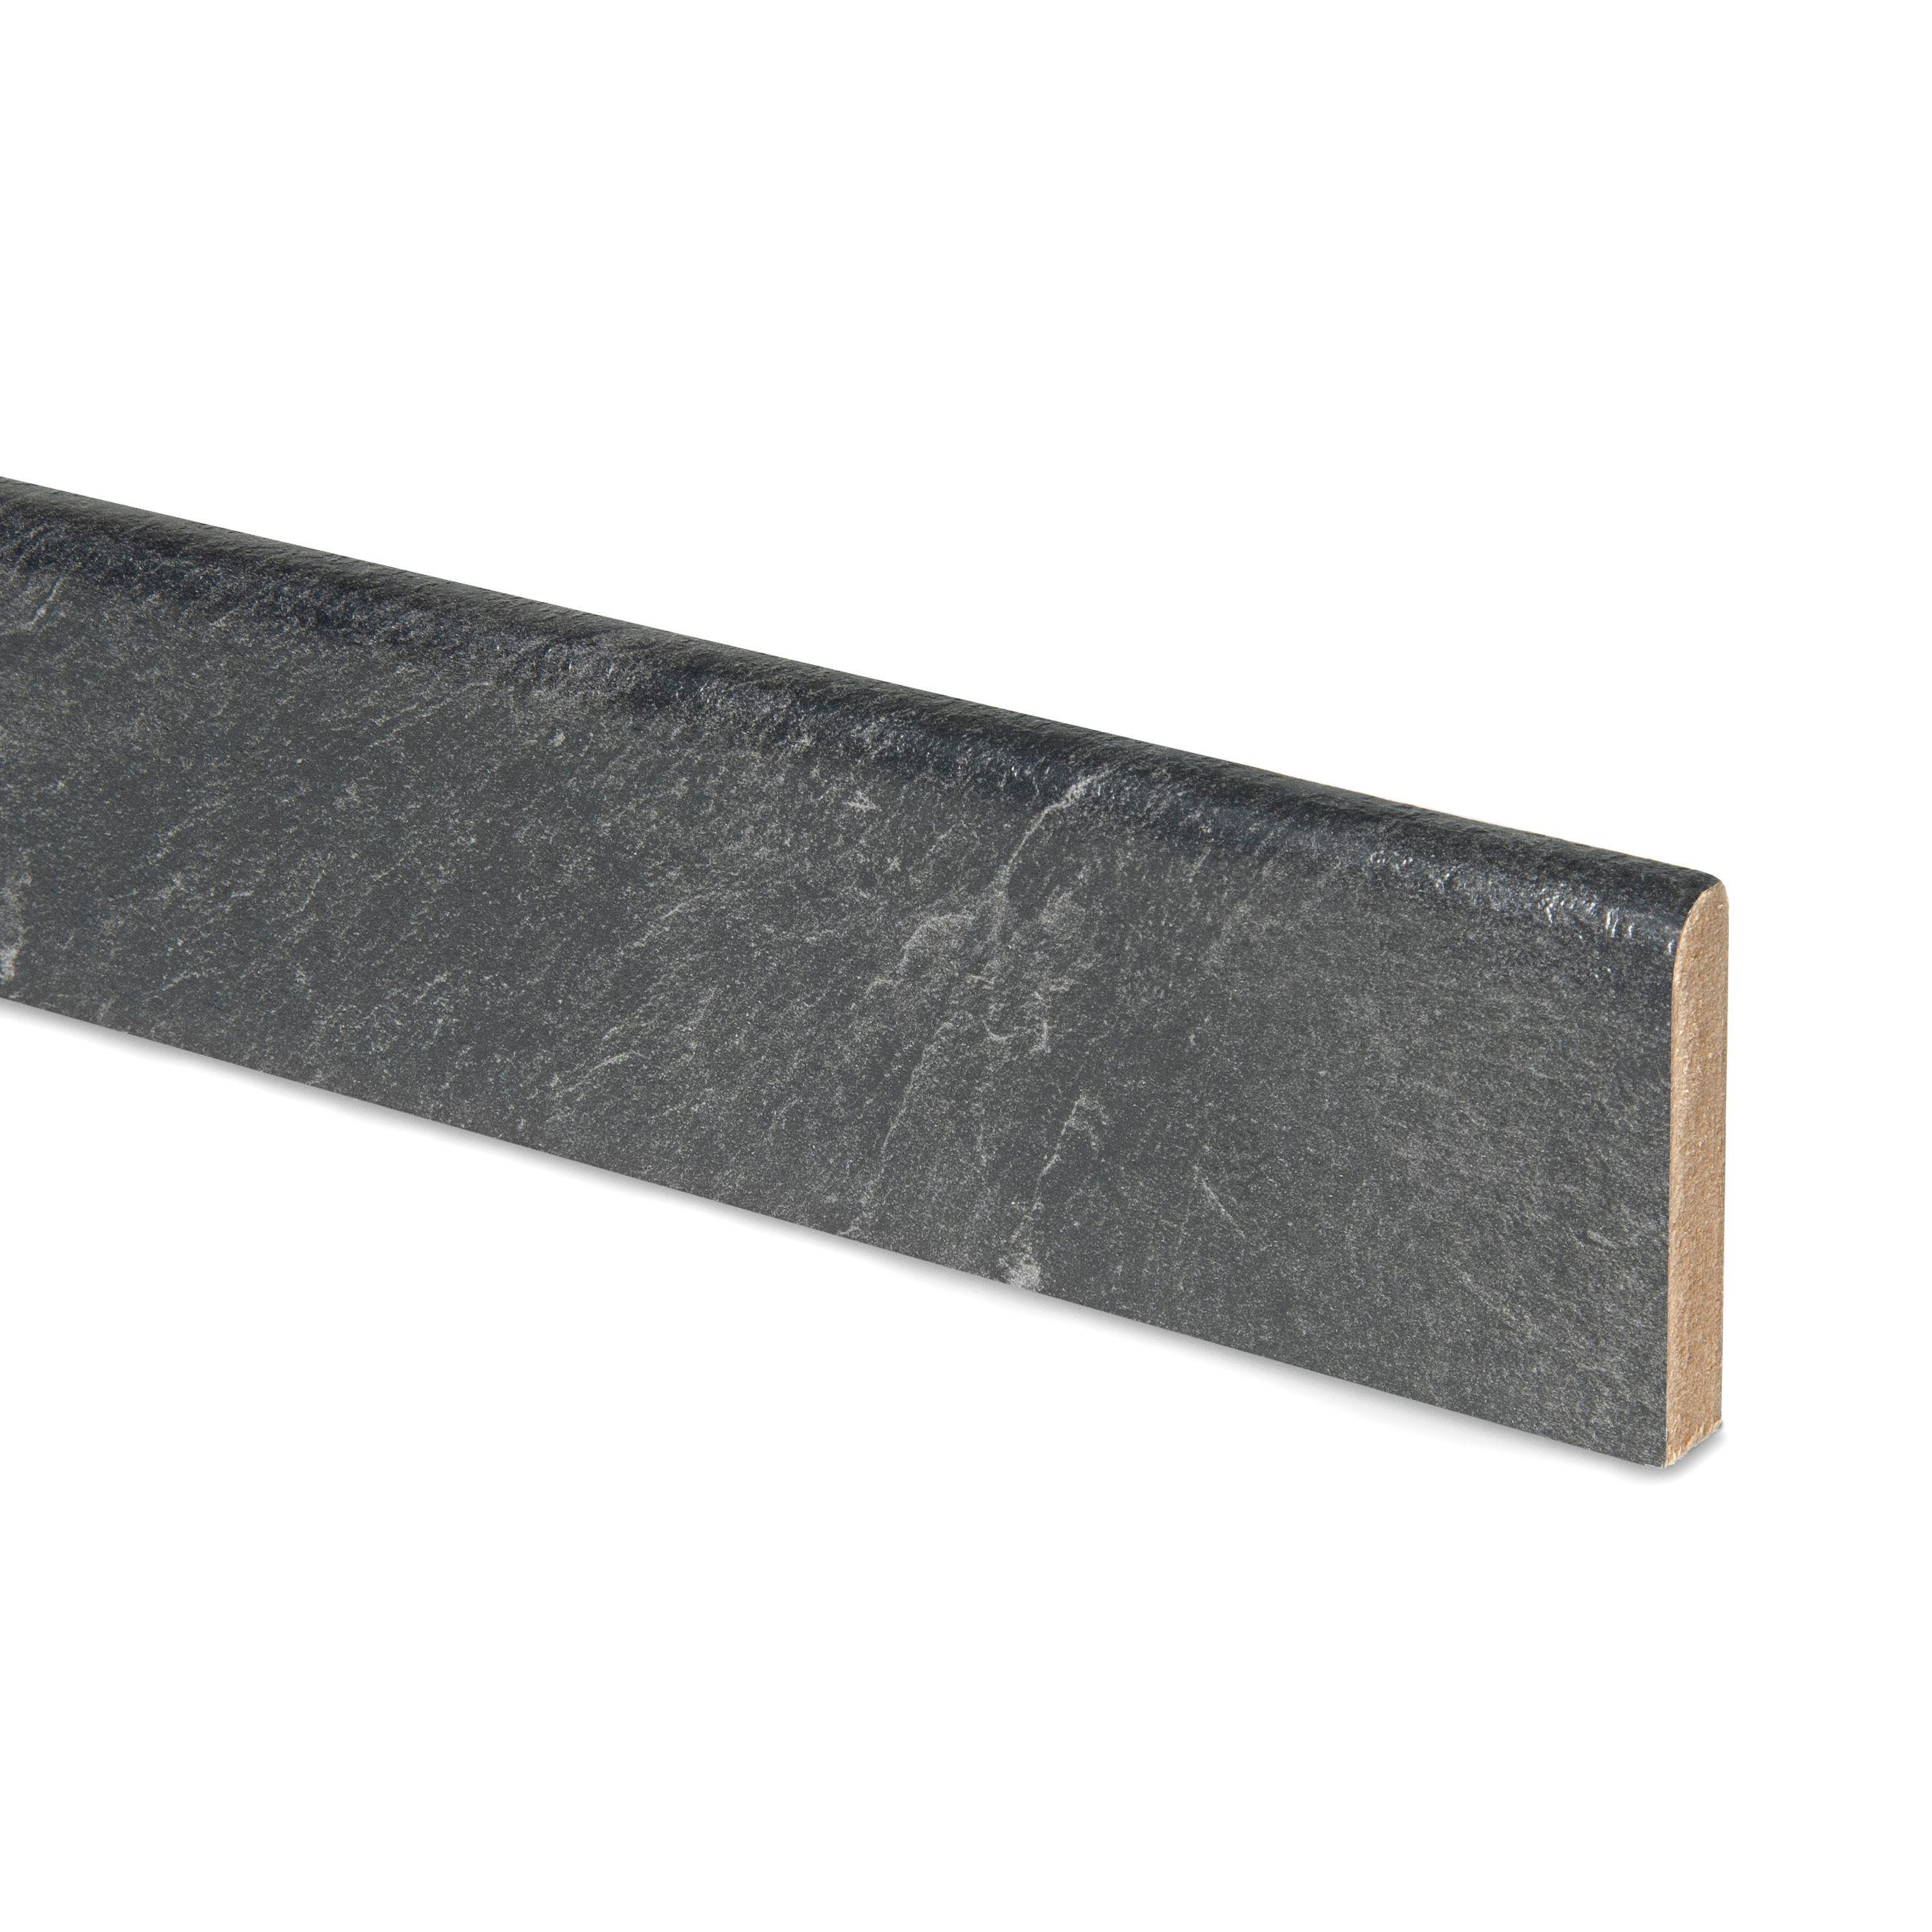 12mm Basalt Slate Grey Laminate Upstand | Departments | DIY at B&Q